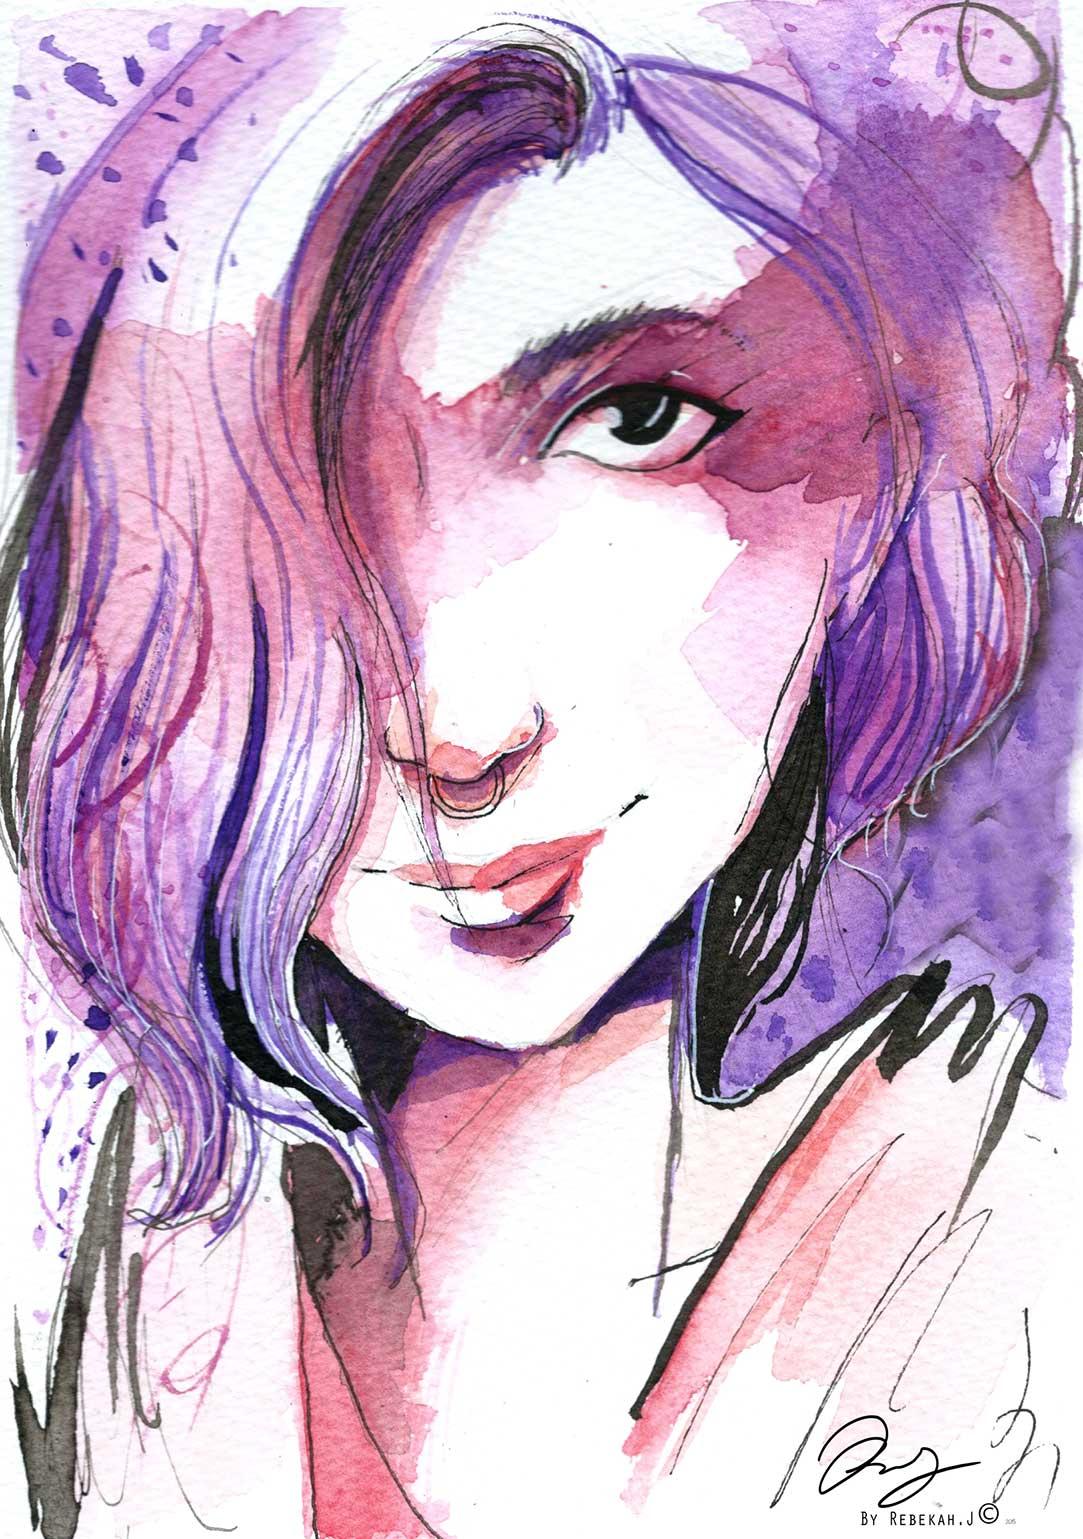 Watercolour Portrait- Breatriz Futigami by Rebekah Joseph